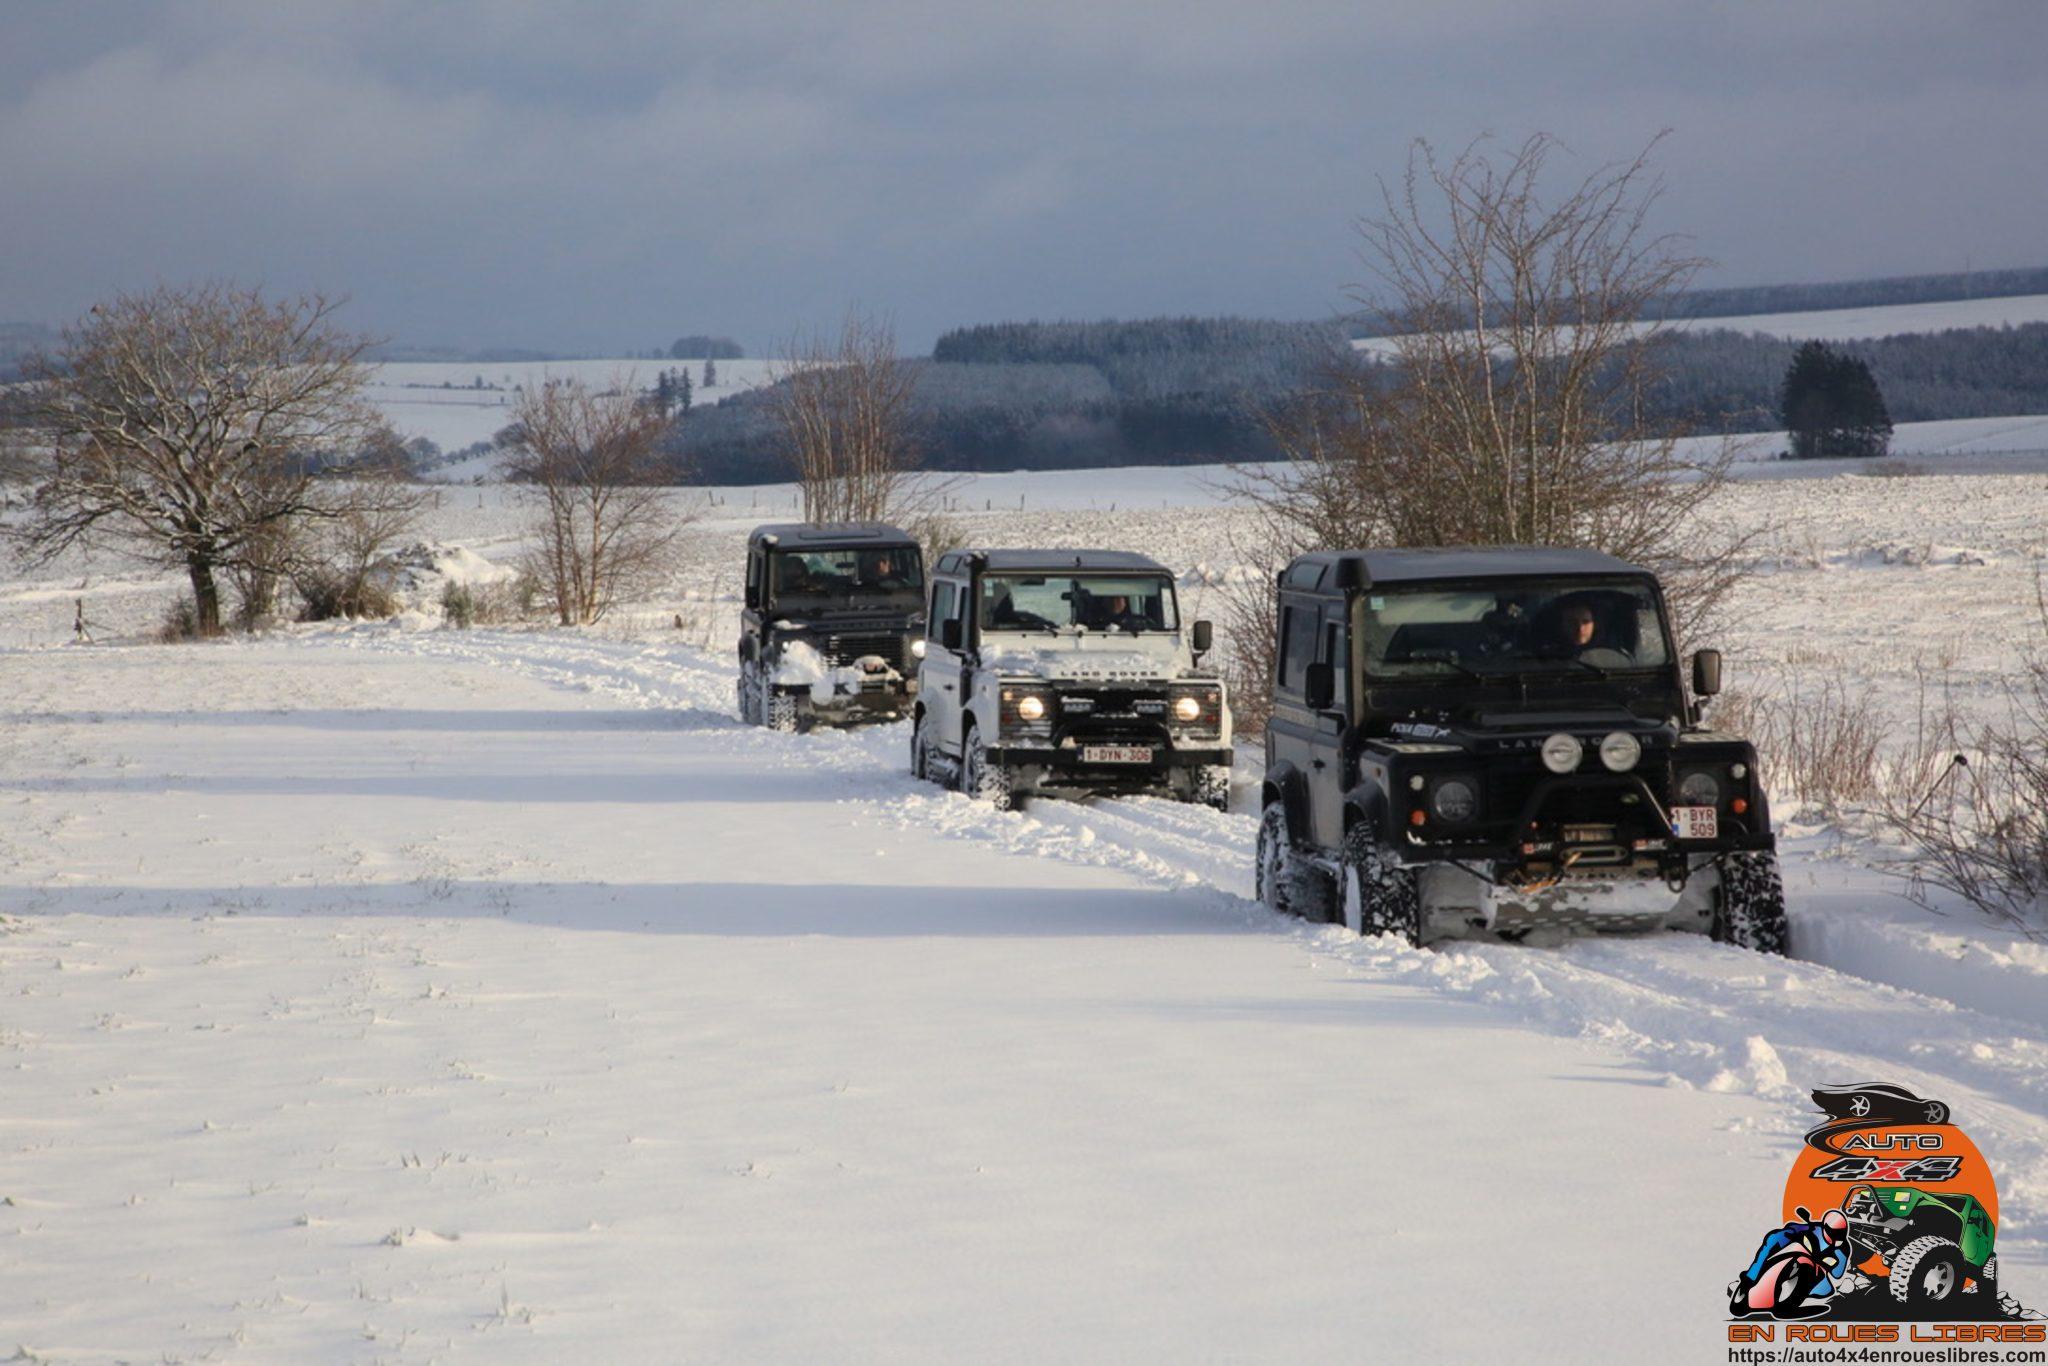 Balade hivernale : entre neige et soleil